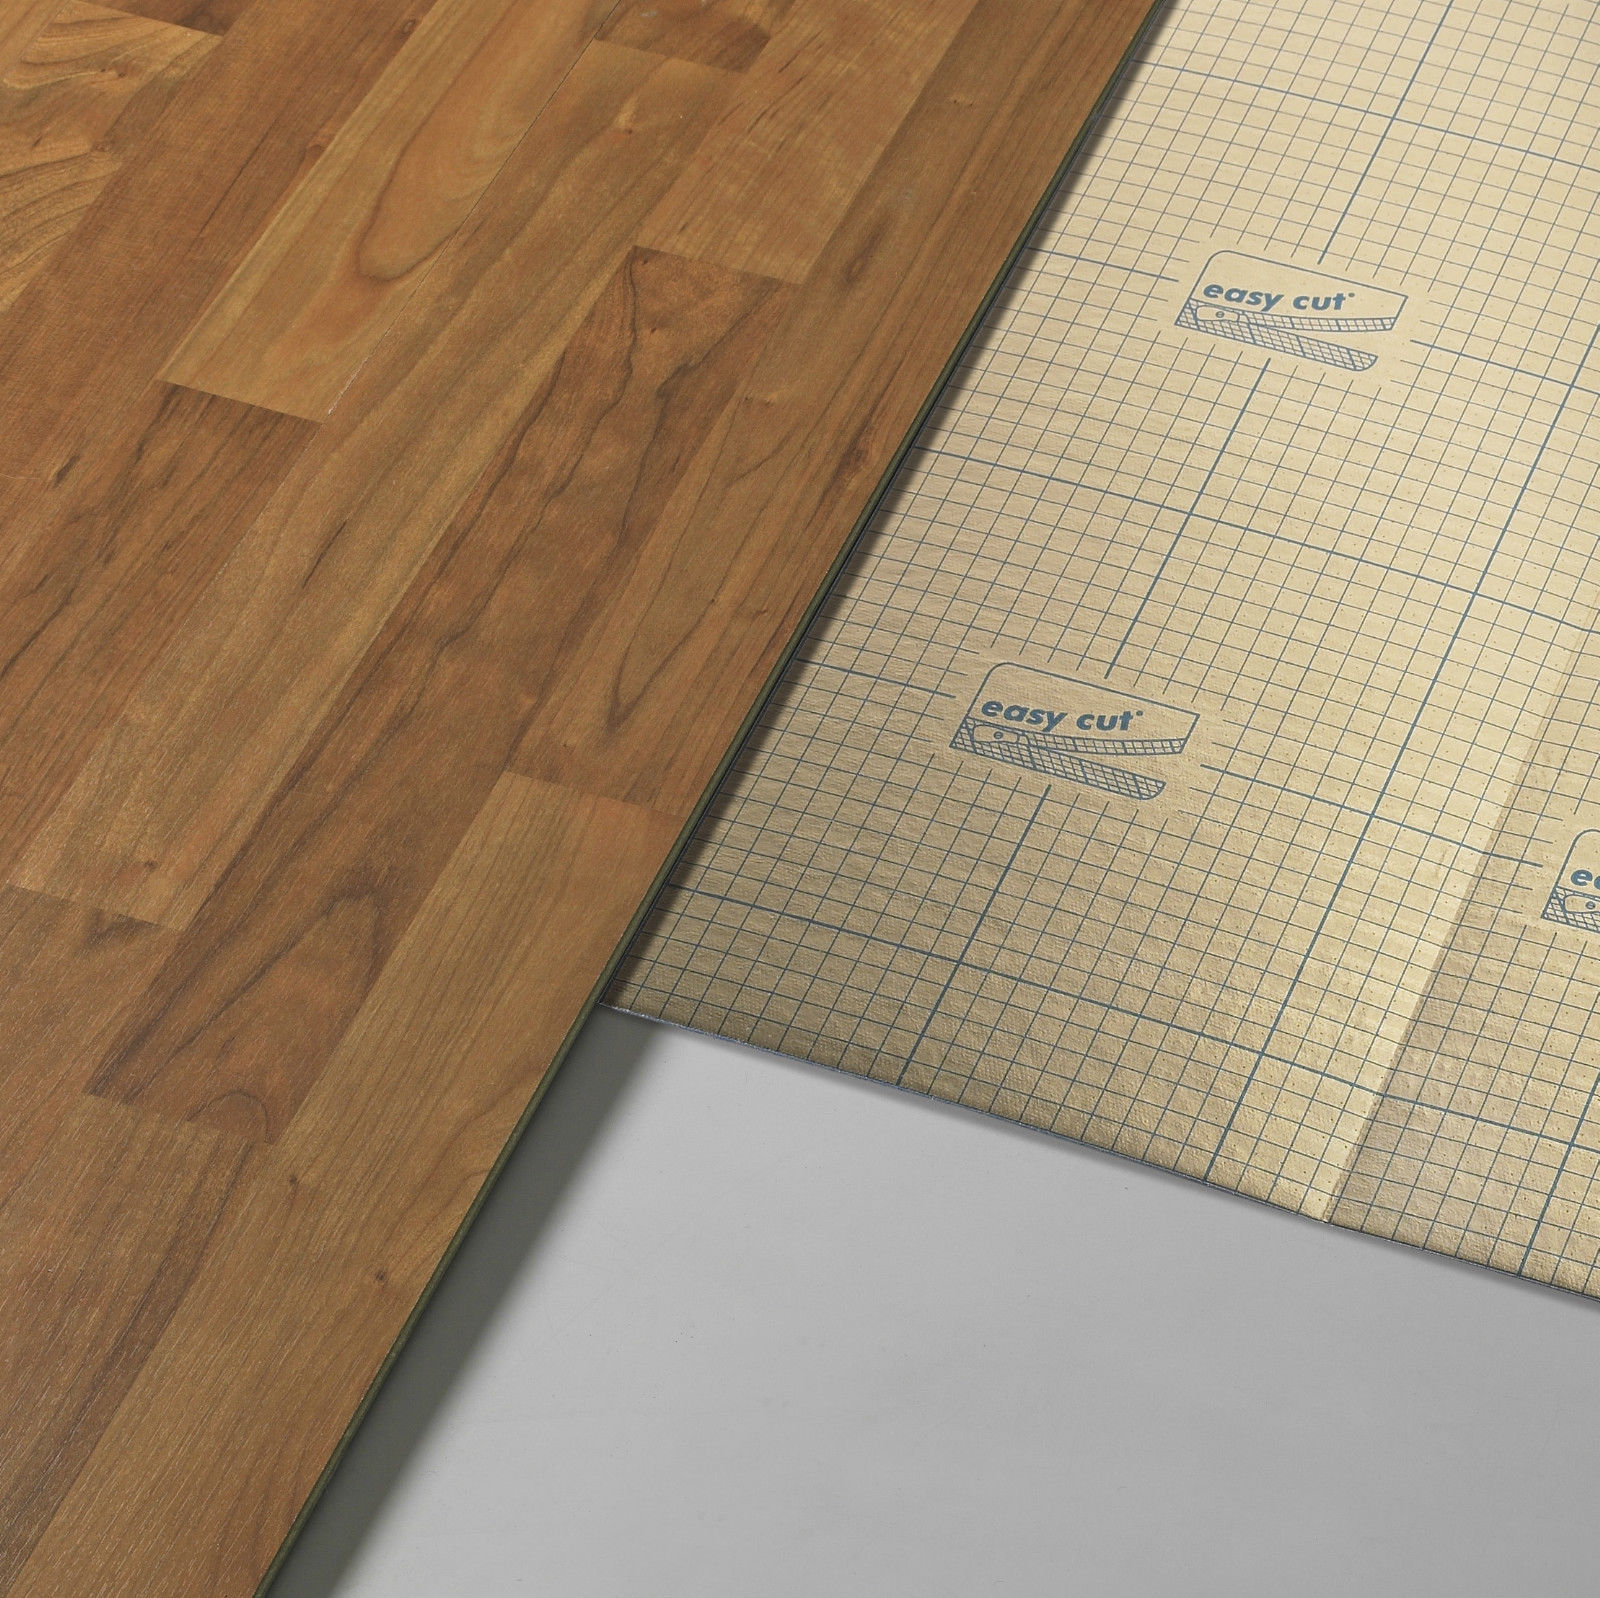 hori vinylboden pvc klick boden eiche ambiente sydney. Black Bedroom Furniture Sets. Home Design Ideas